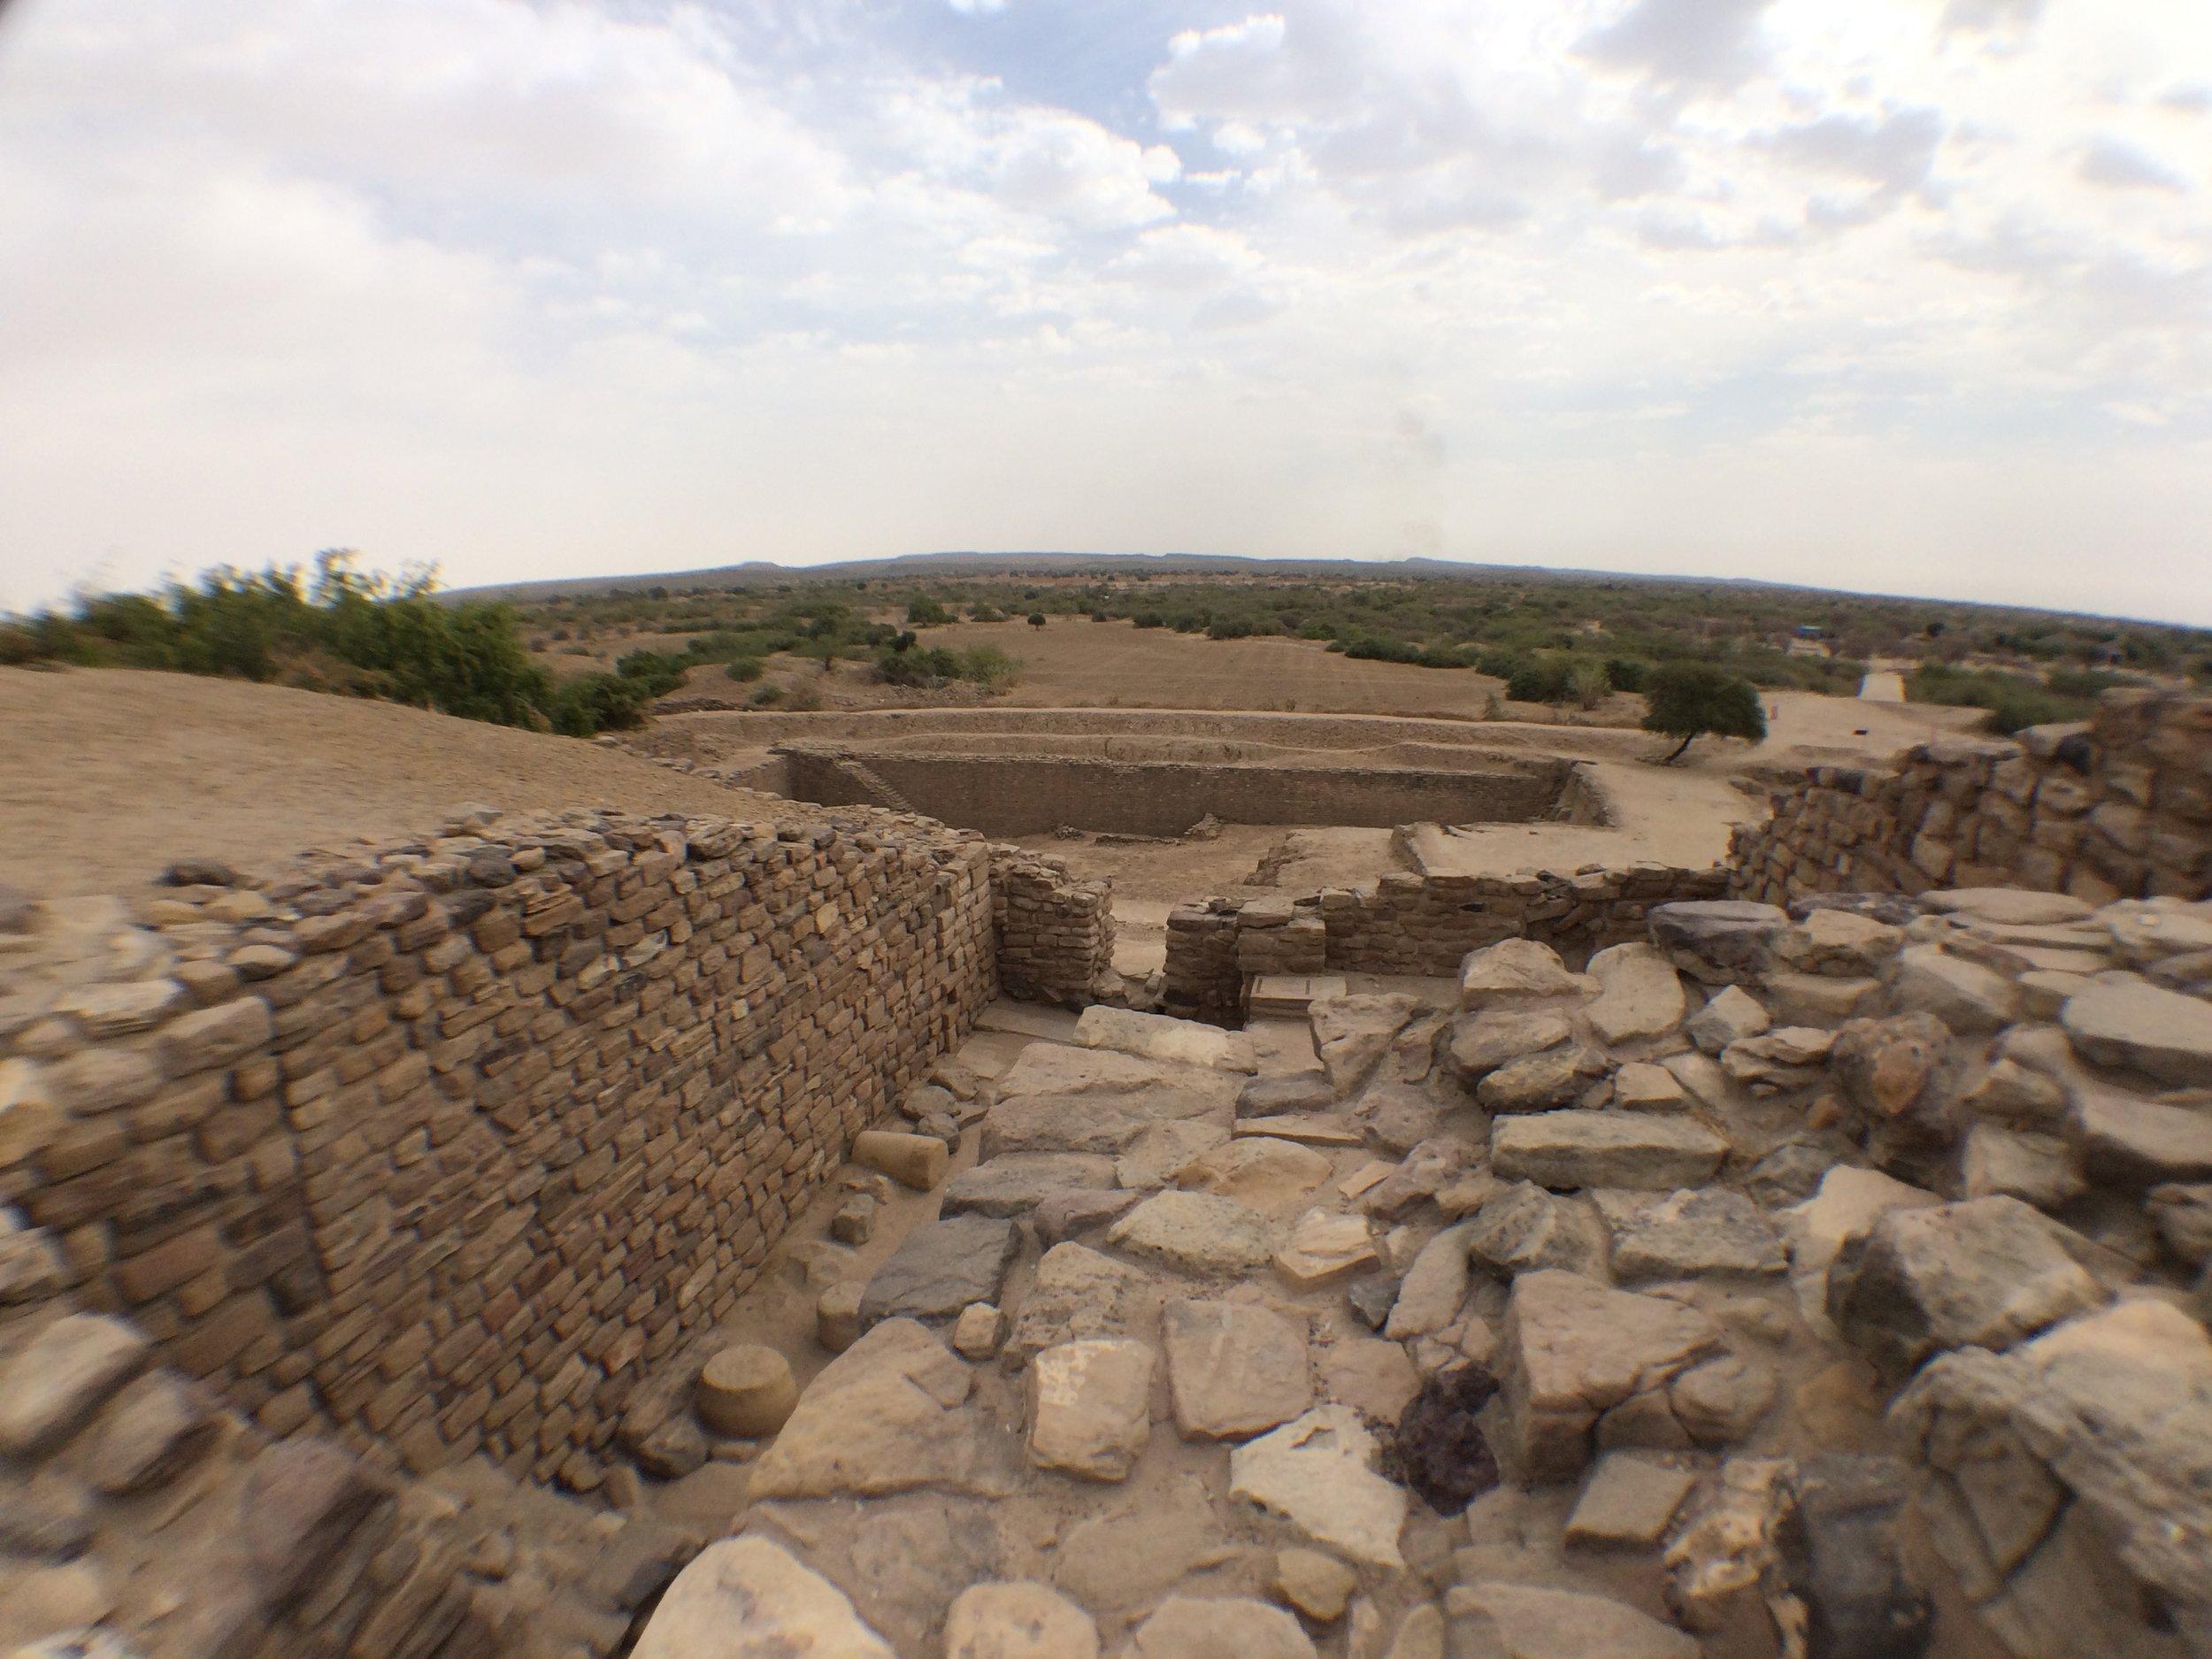 Paved pathways running through the citadel.